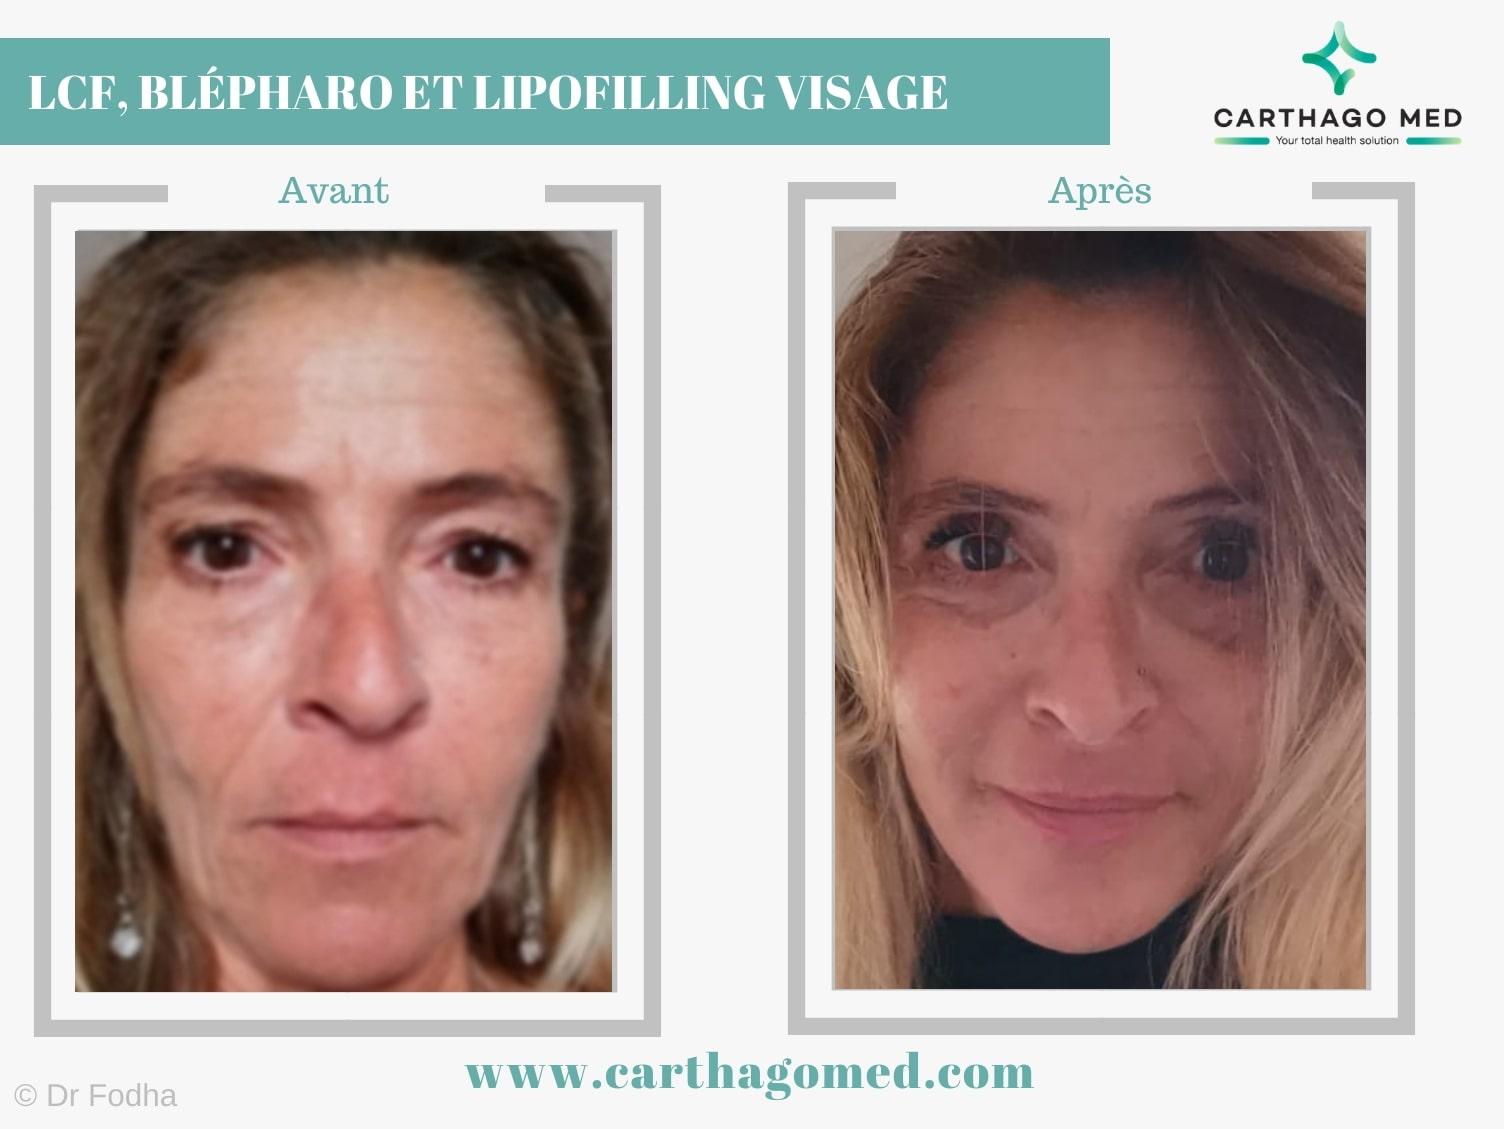 LCF Lipofilling visage et blépharoplastie